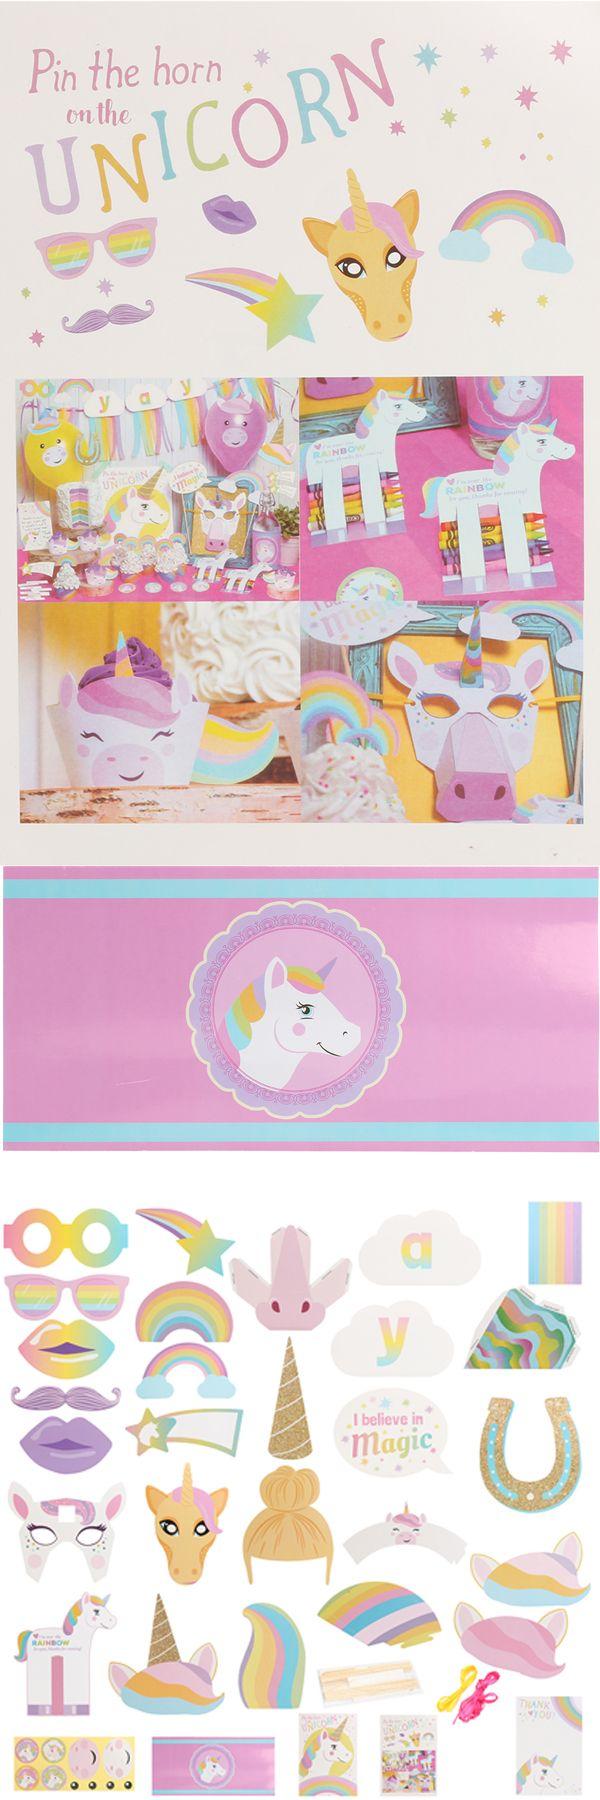 Unicorn Kids Happy Birthday Party Supplies Mask Cake Topper Paper Home Decor Set